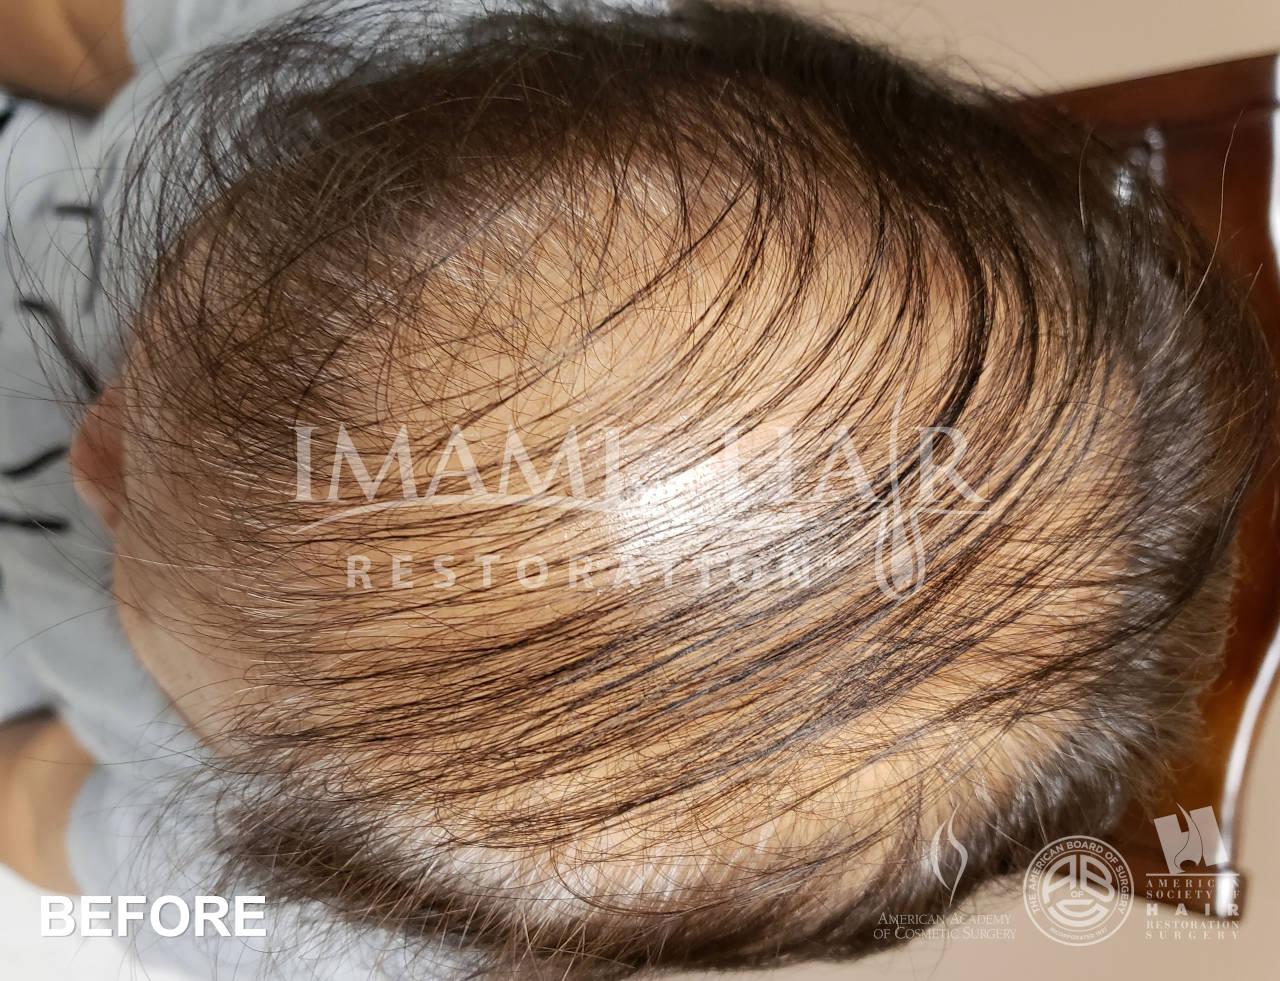 Severe Ludwig II Hair Loss